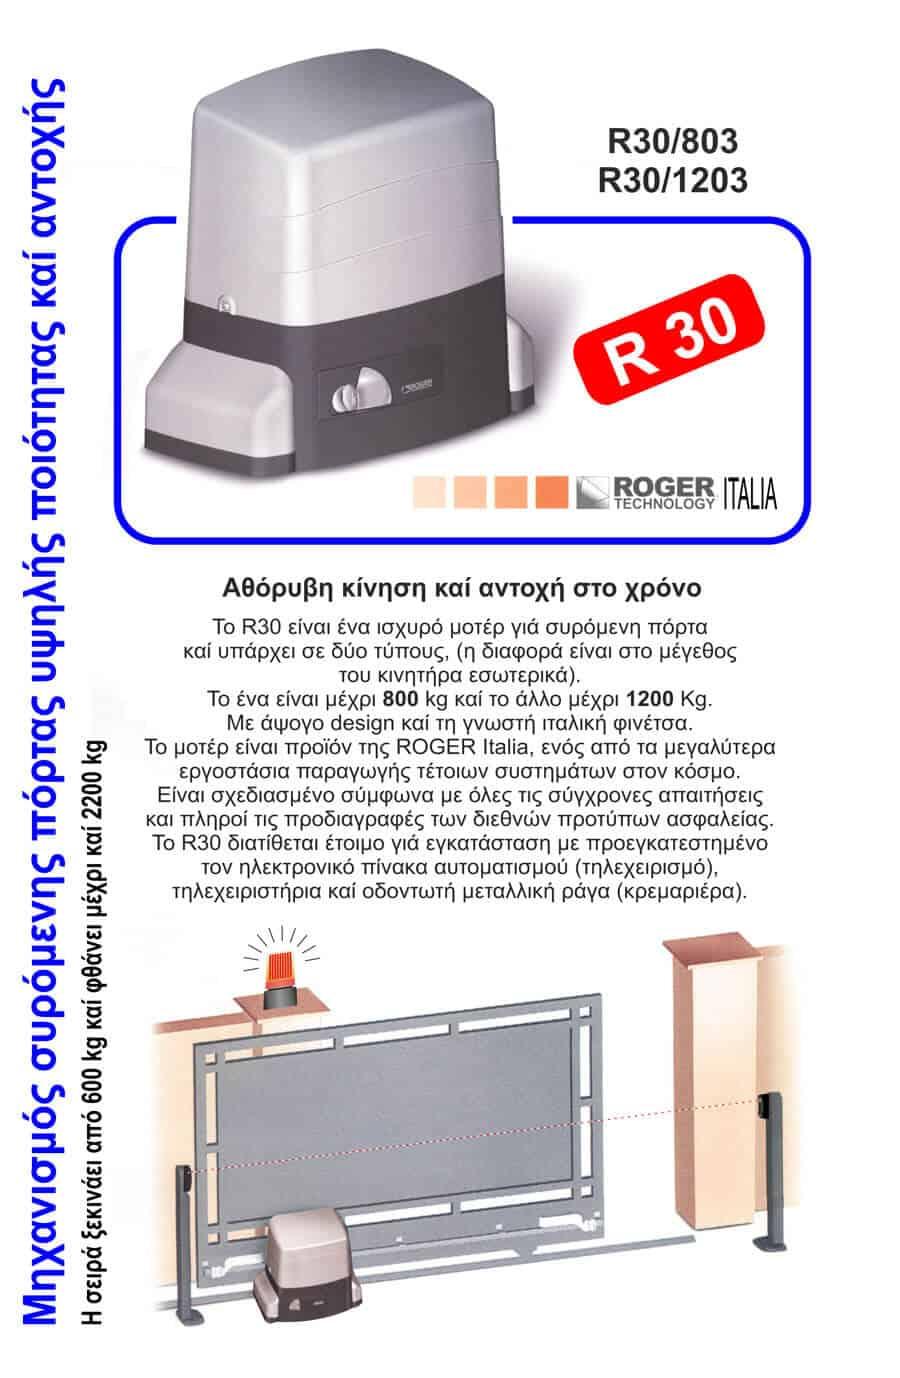 syromenoi-05